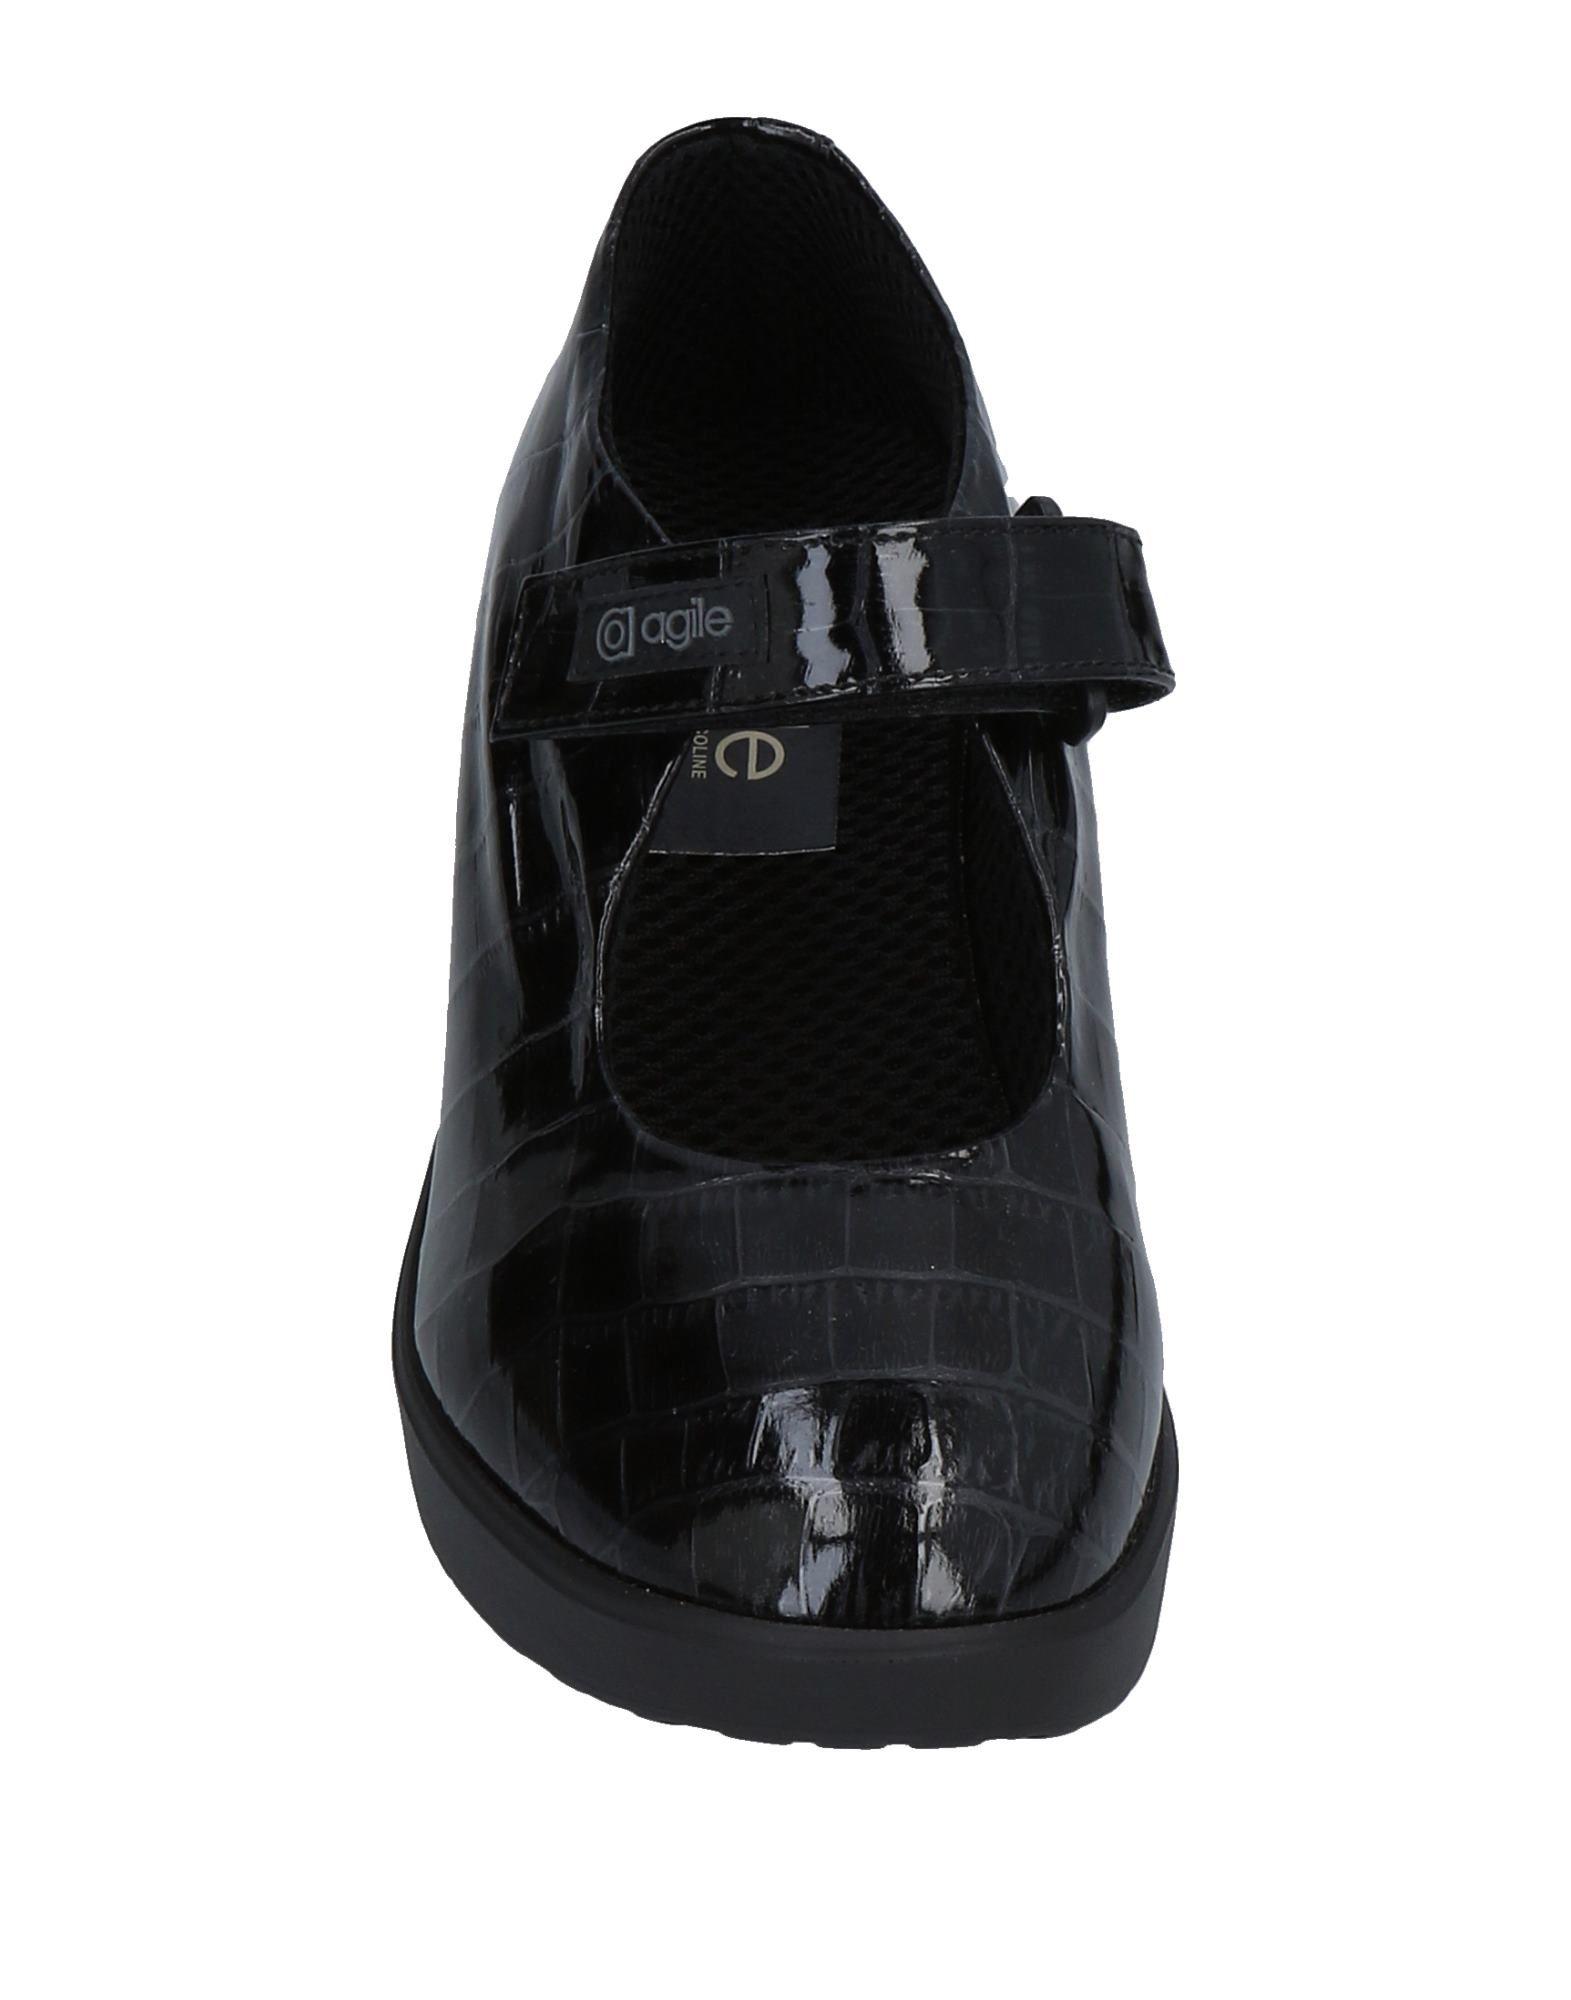 Agile By Rucoline Gute Pumps Damen  11496929TO Gute Rucoline Qualität beliebte Schuhe 20c25e